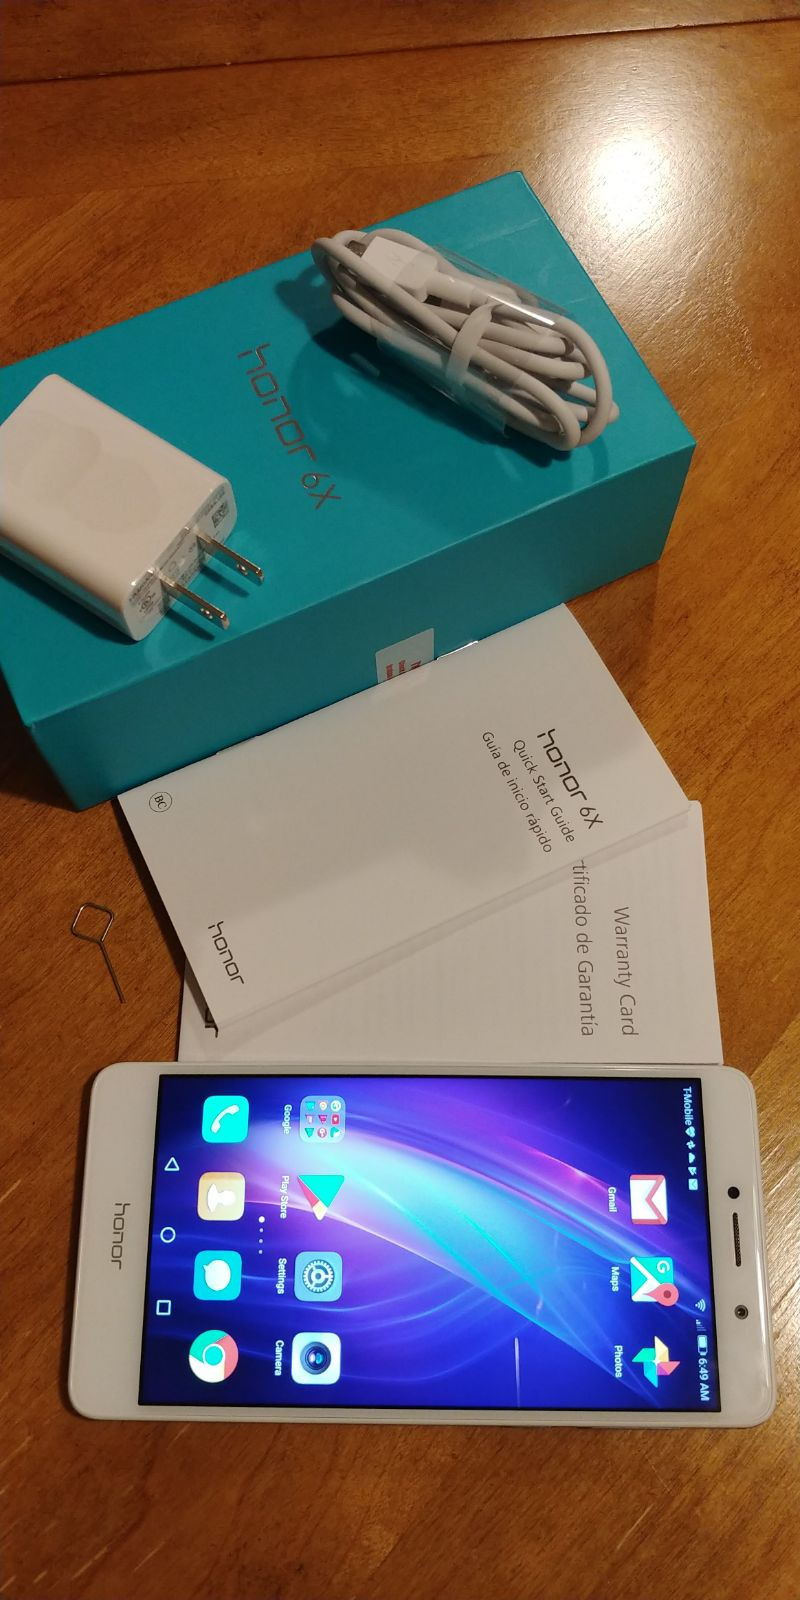 Huawei Honor 6X Dual Camera Unlocked32GB